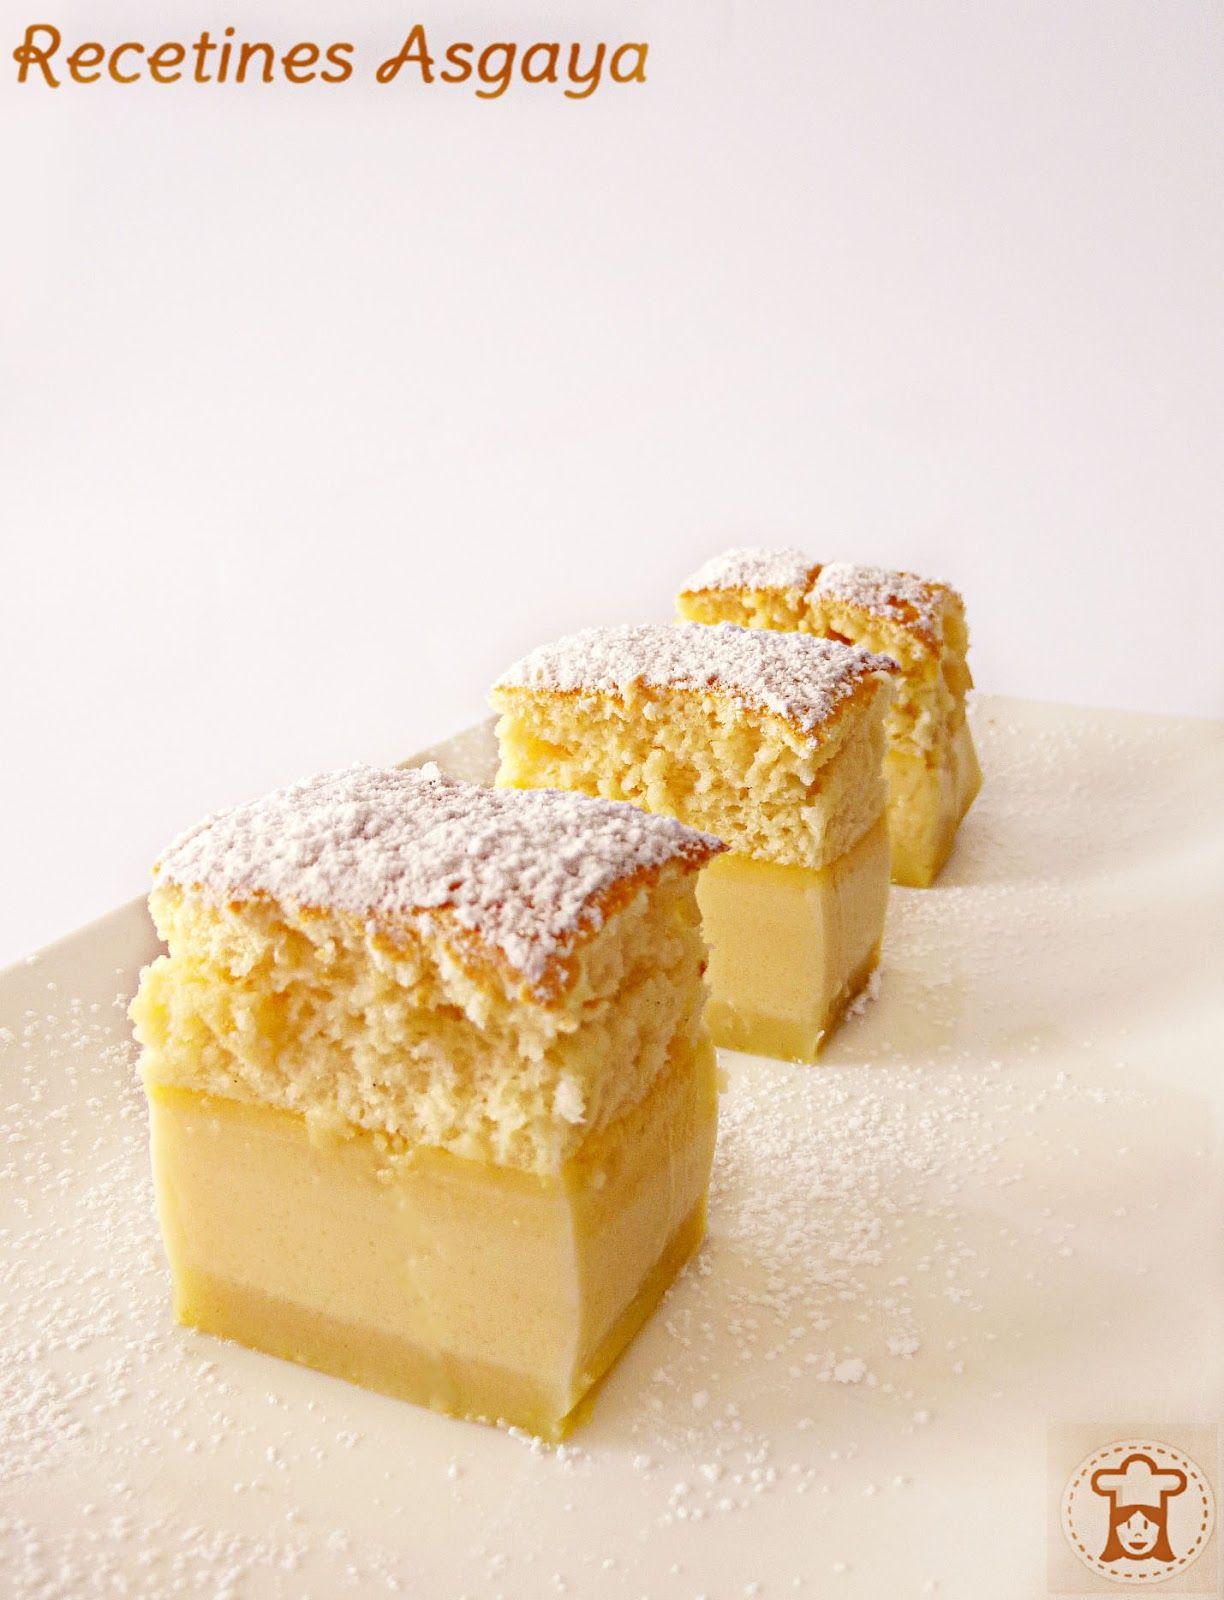 Intelligent Cake / Pastel Inteligente _ Recetines Asgaya